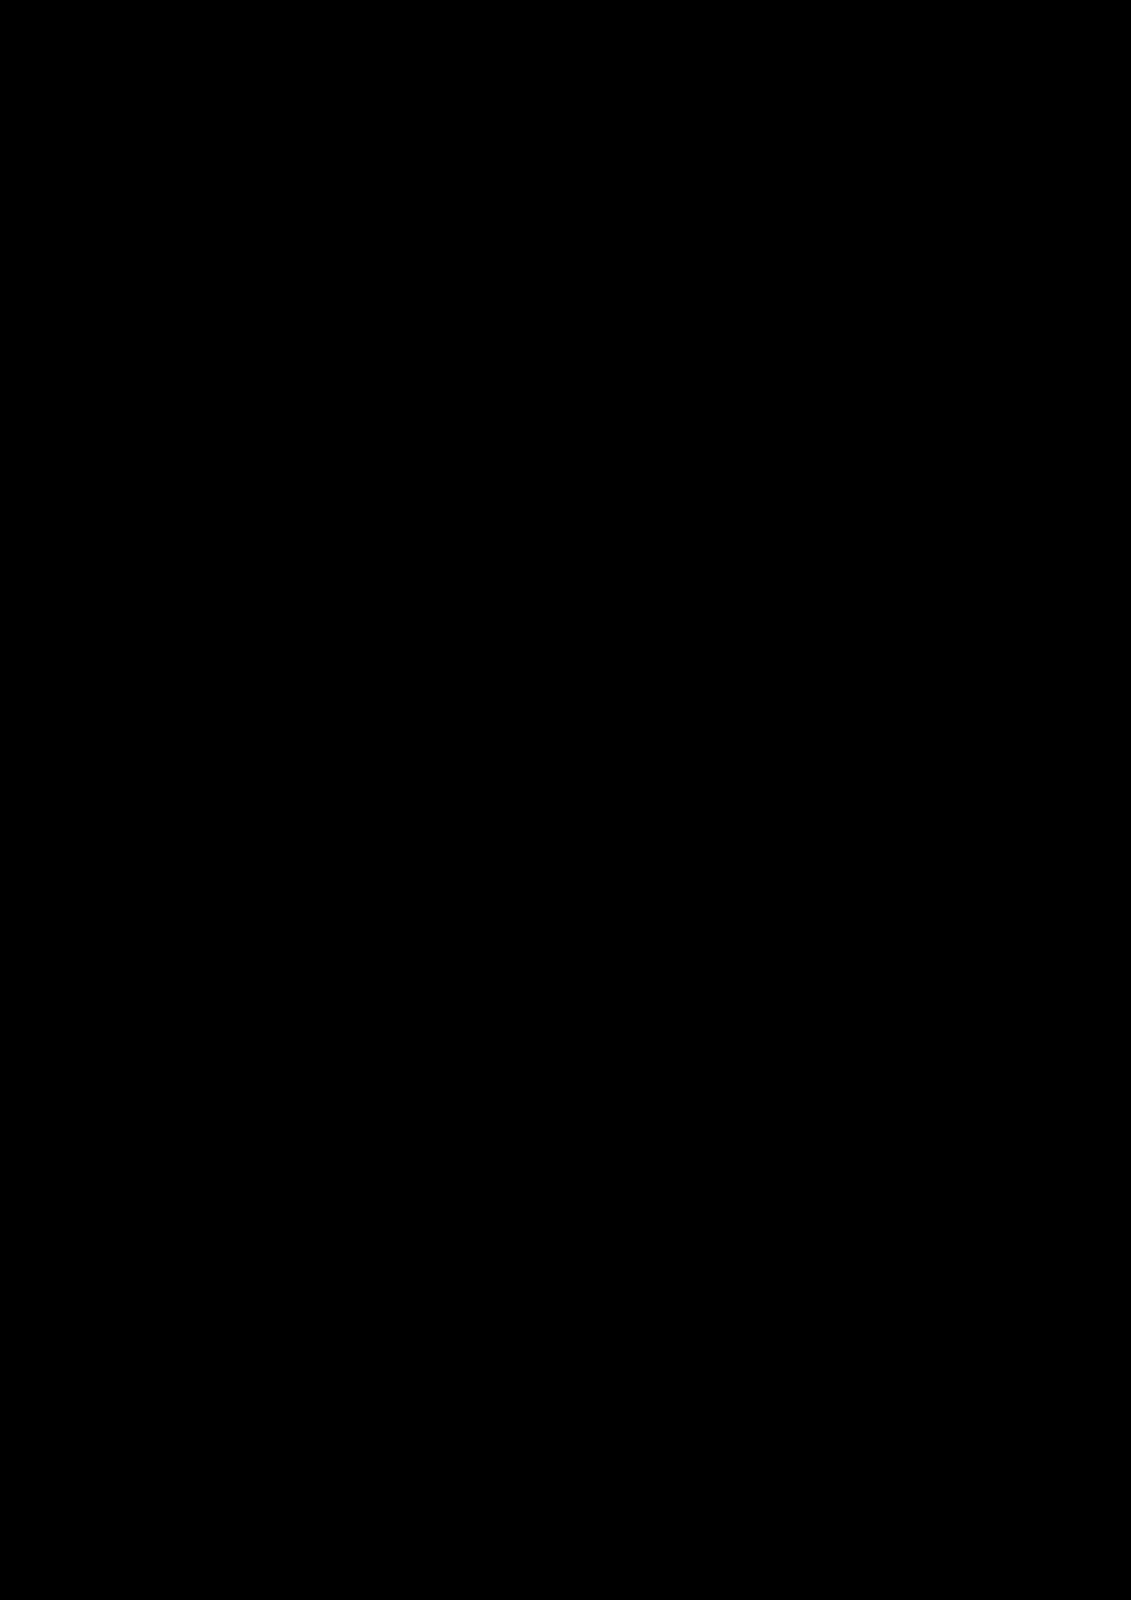 diegosax: Super Mario Bros Partitura para Flauta, Violín